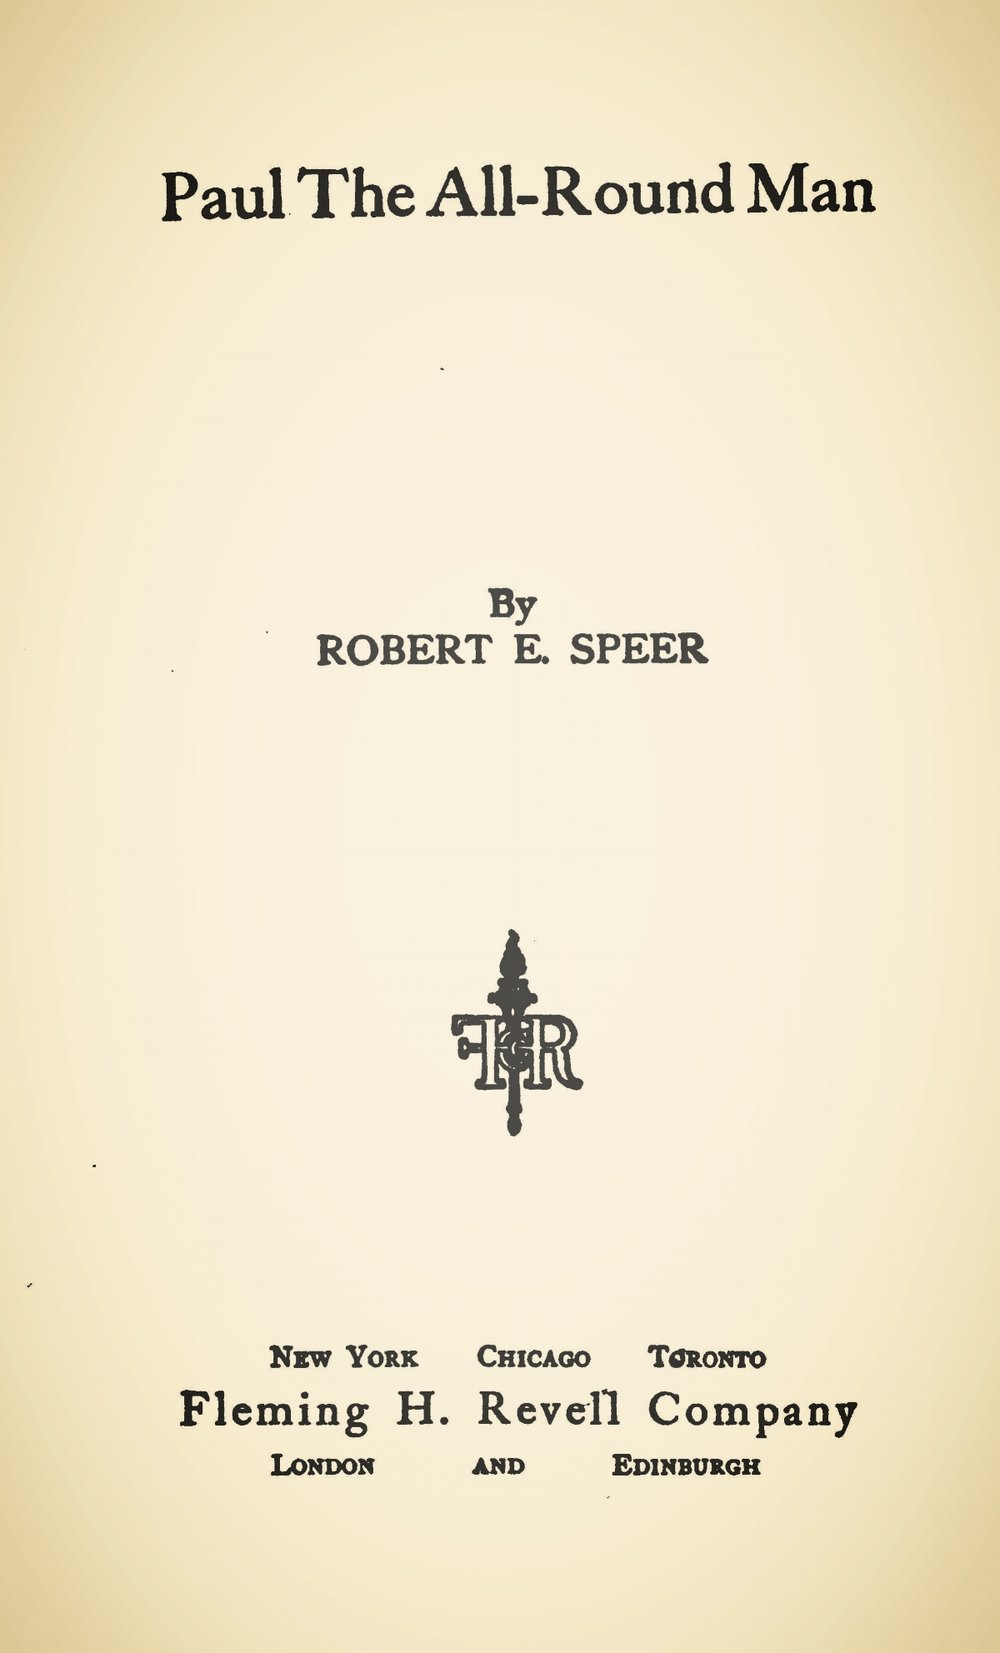 Speer, Robert Elliott, Paul, the All-Round Man Title Page.jpg